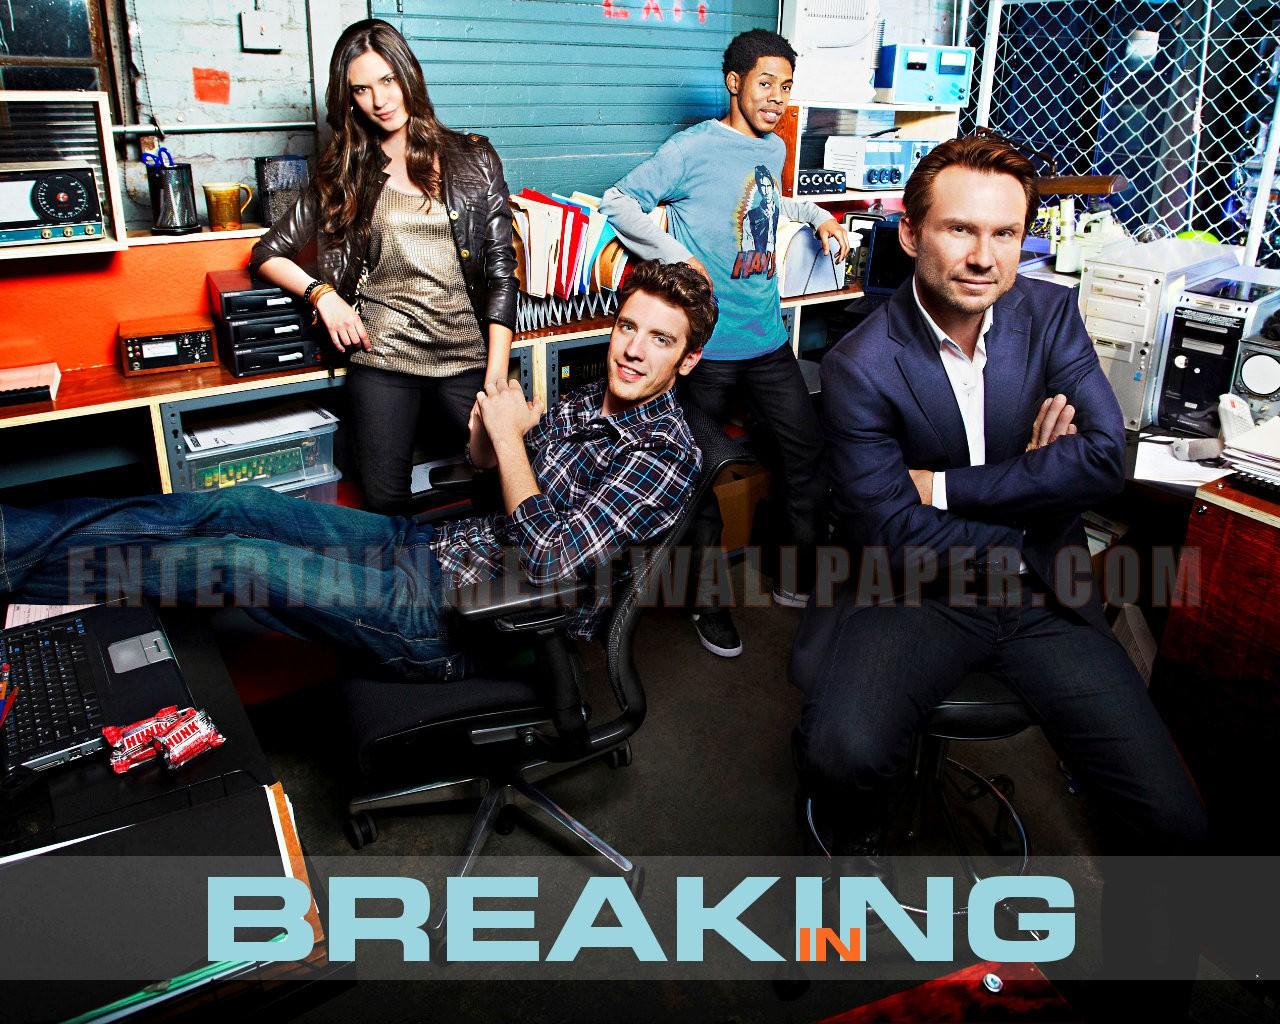 Breaking In S01 DVDRip | S02 HDTV Tvbreakingin02